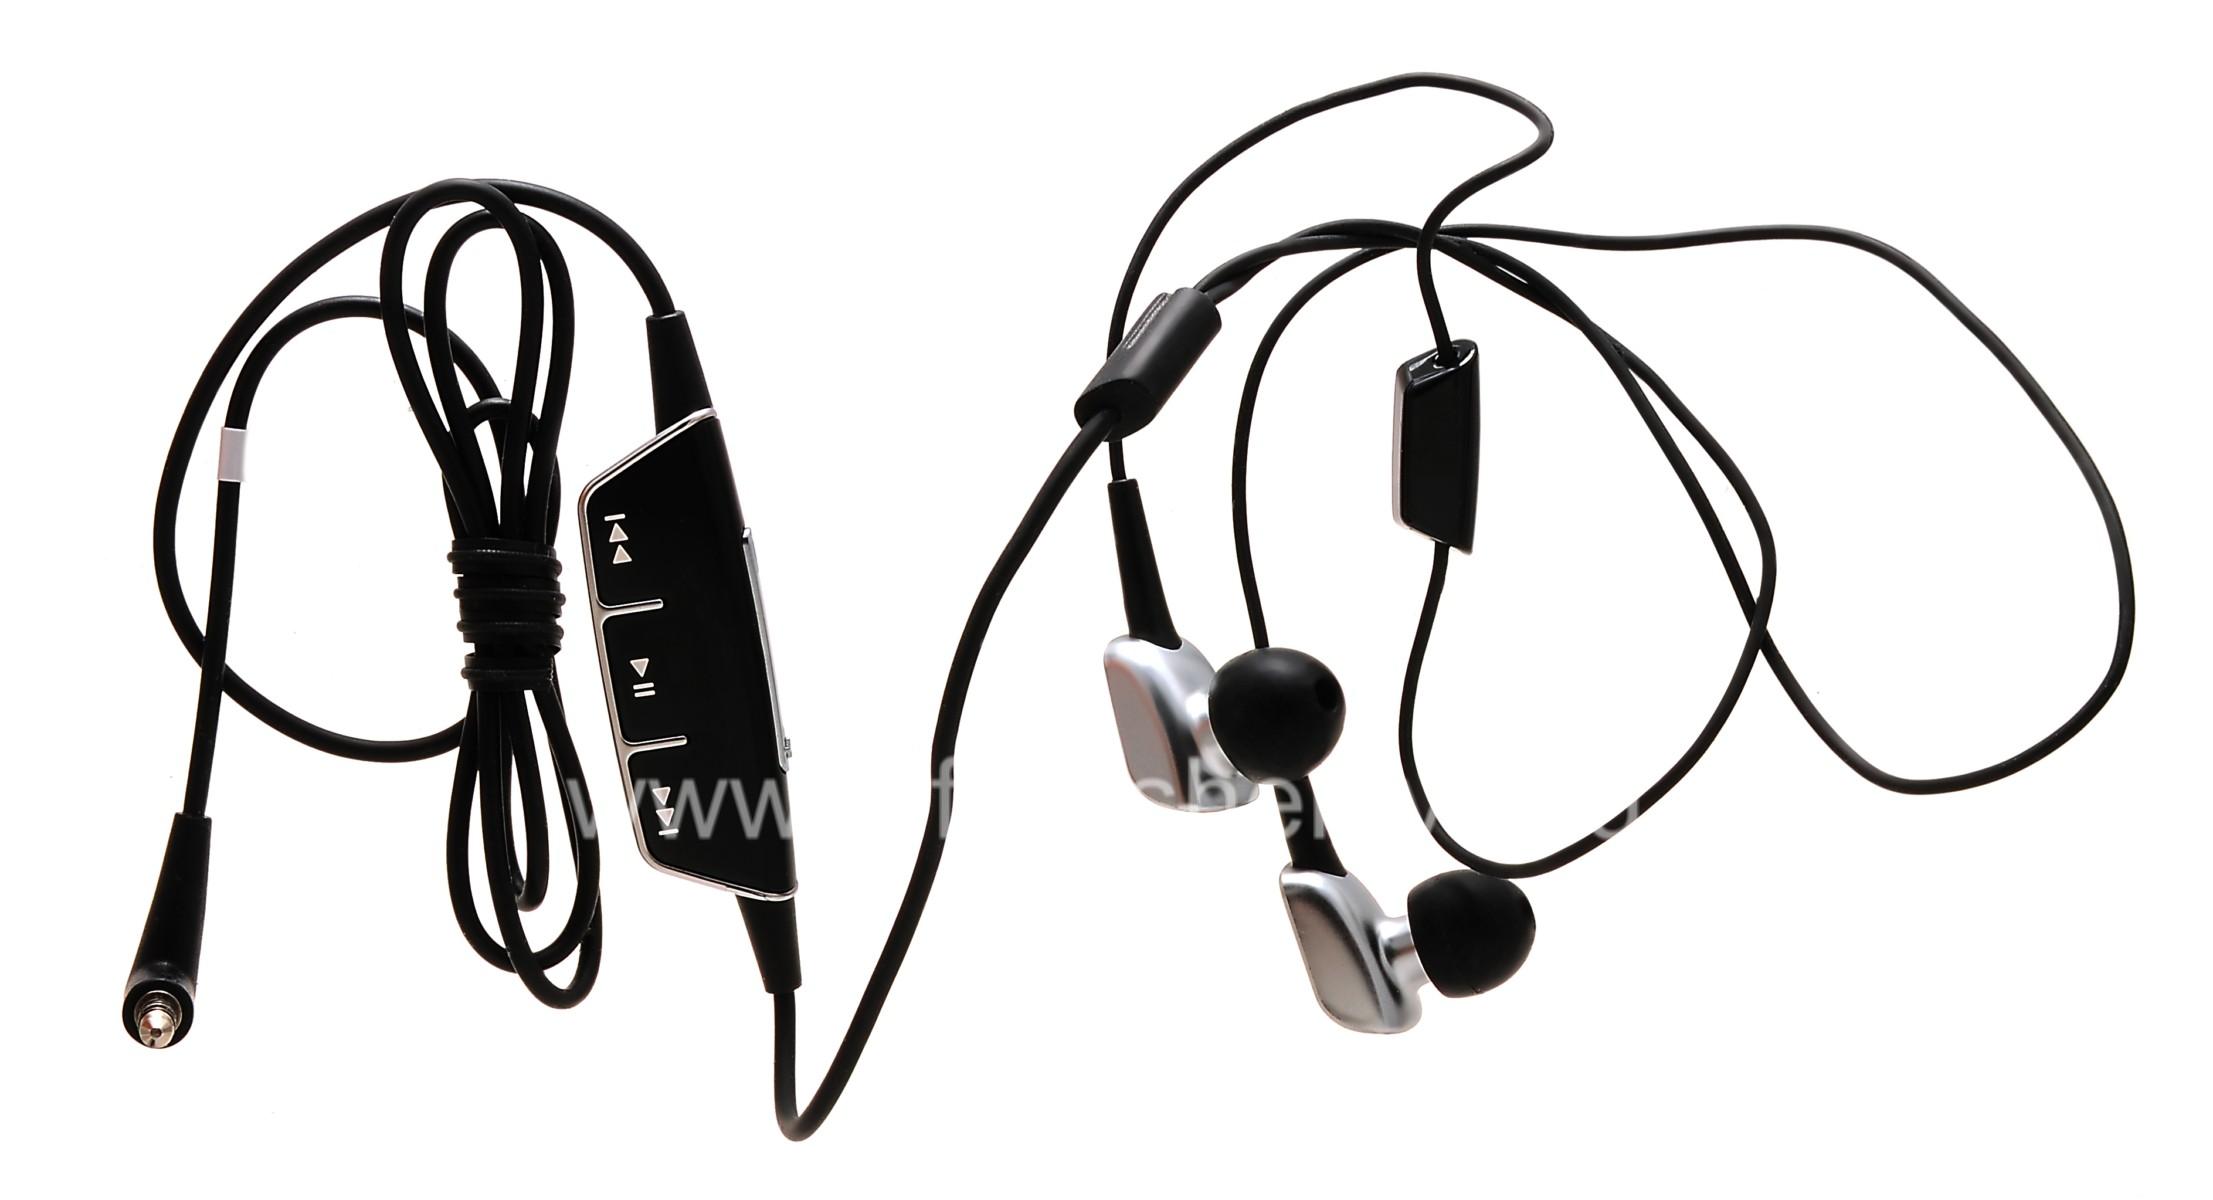 Оригинальная гарнитура 3.5mm Premium Multimedia Stereo